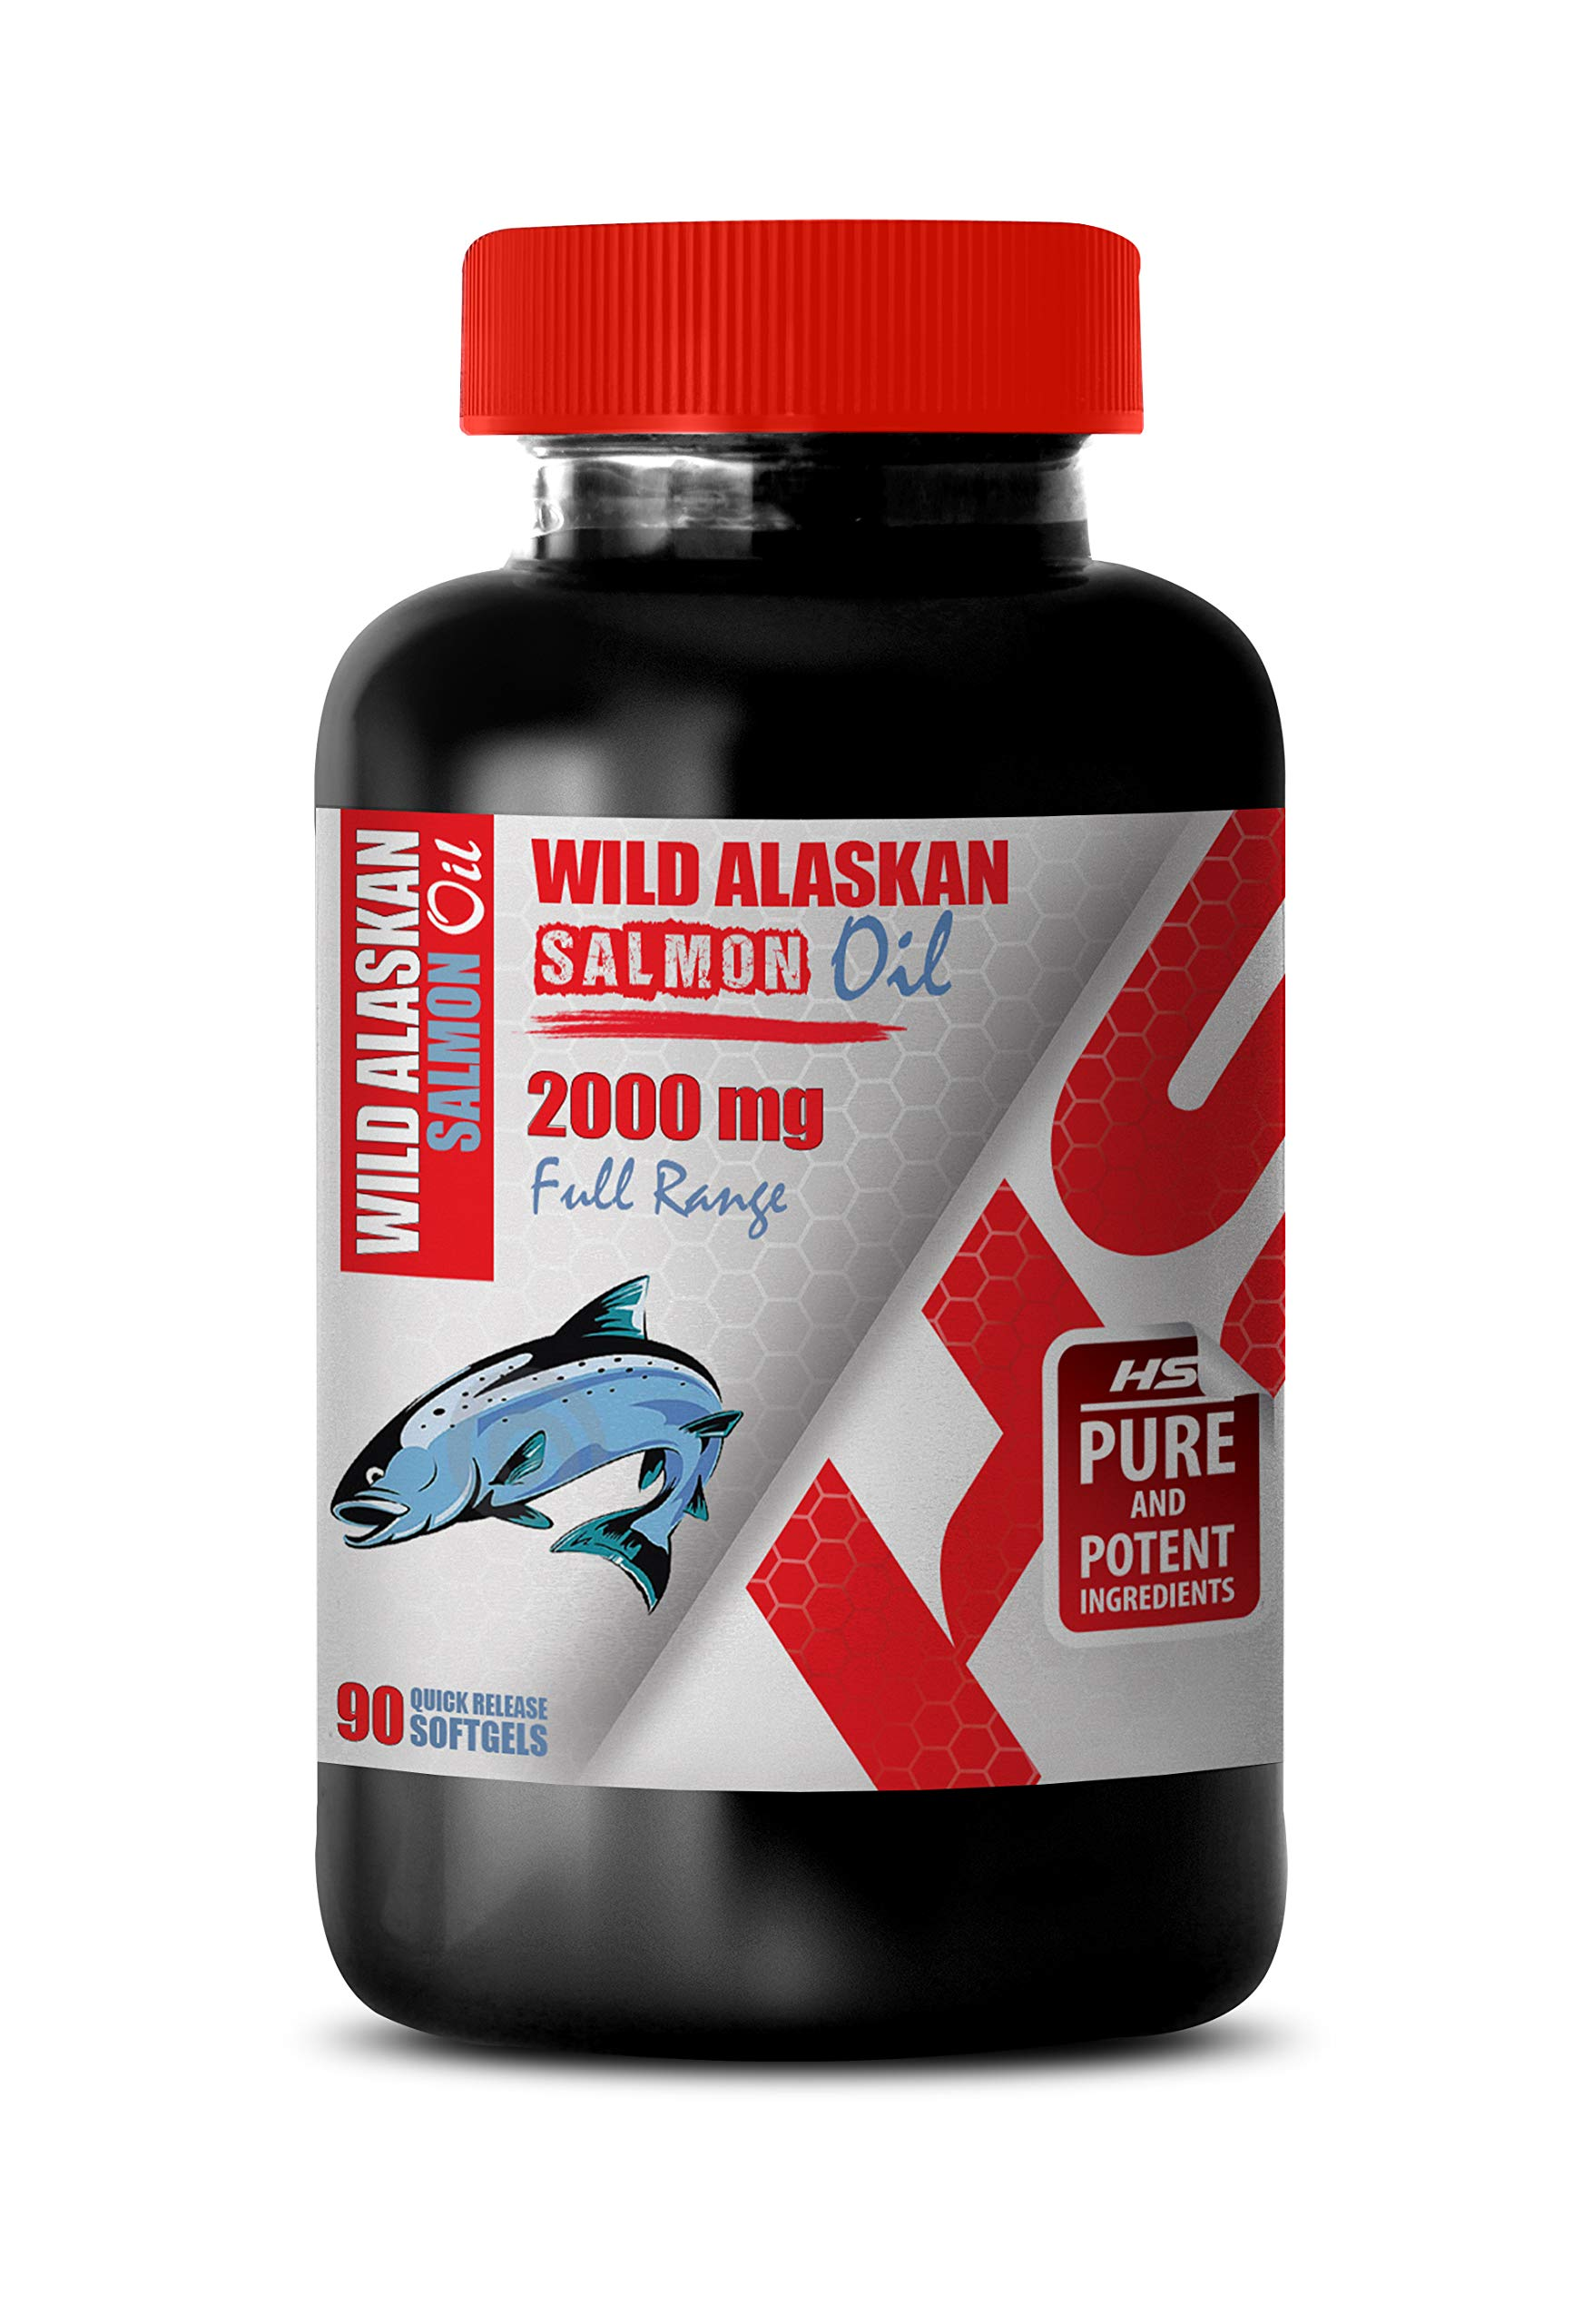 Brain Health Memory and Focus - Wild Alaskan Salmon Oil 2000 Mg Full Range - Wild Alaskan Salmon Oil for People - 1 Bottle 90 Softgels by Healthy Supplements LLC